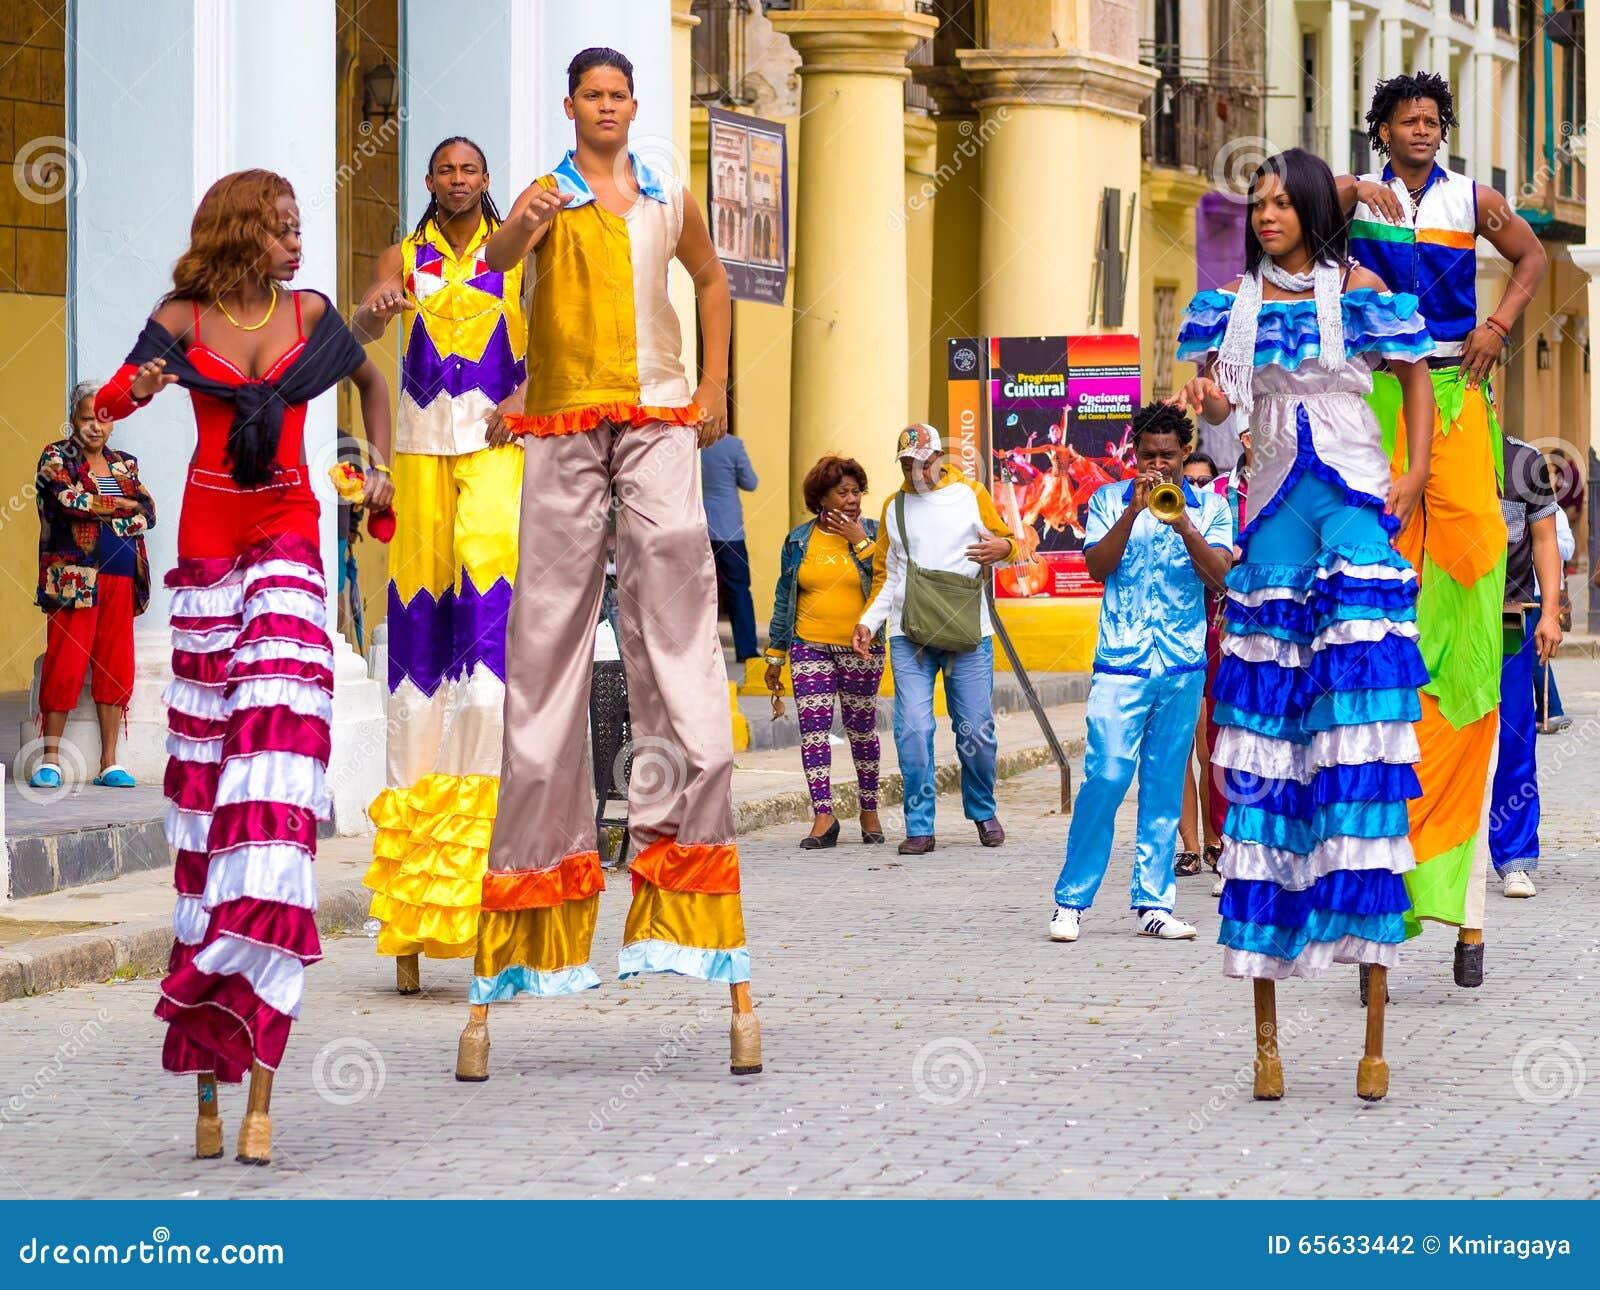 54cbdde60d32 Ζωηρόχρωμοι χορευτές οδών στα ξυλοπόδαρα στην παλαιά Αβάνα Εκδοτική ...